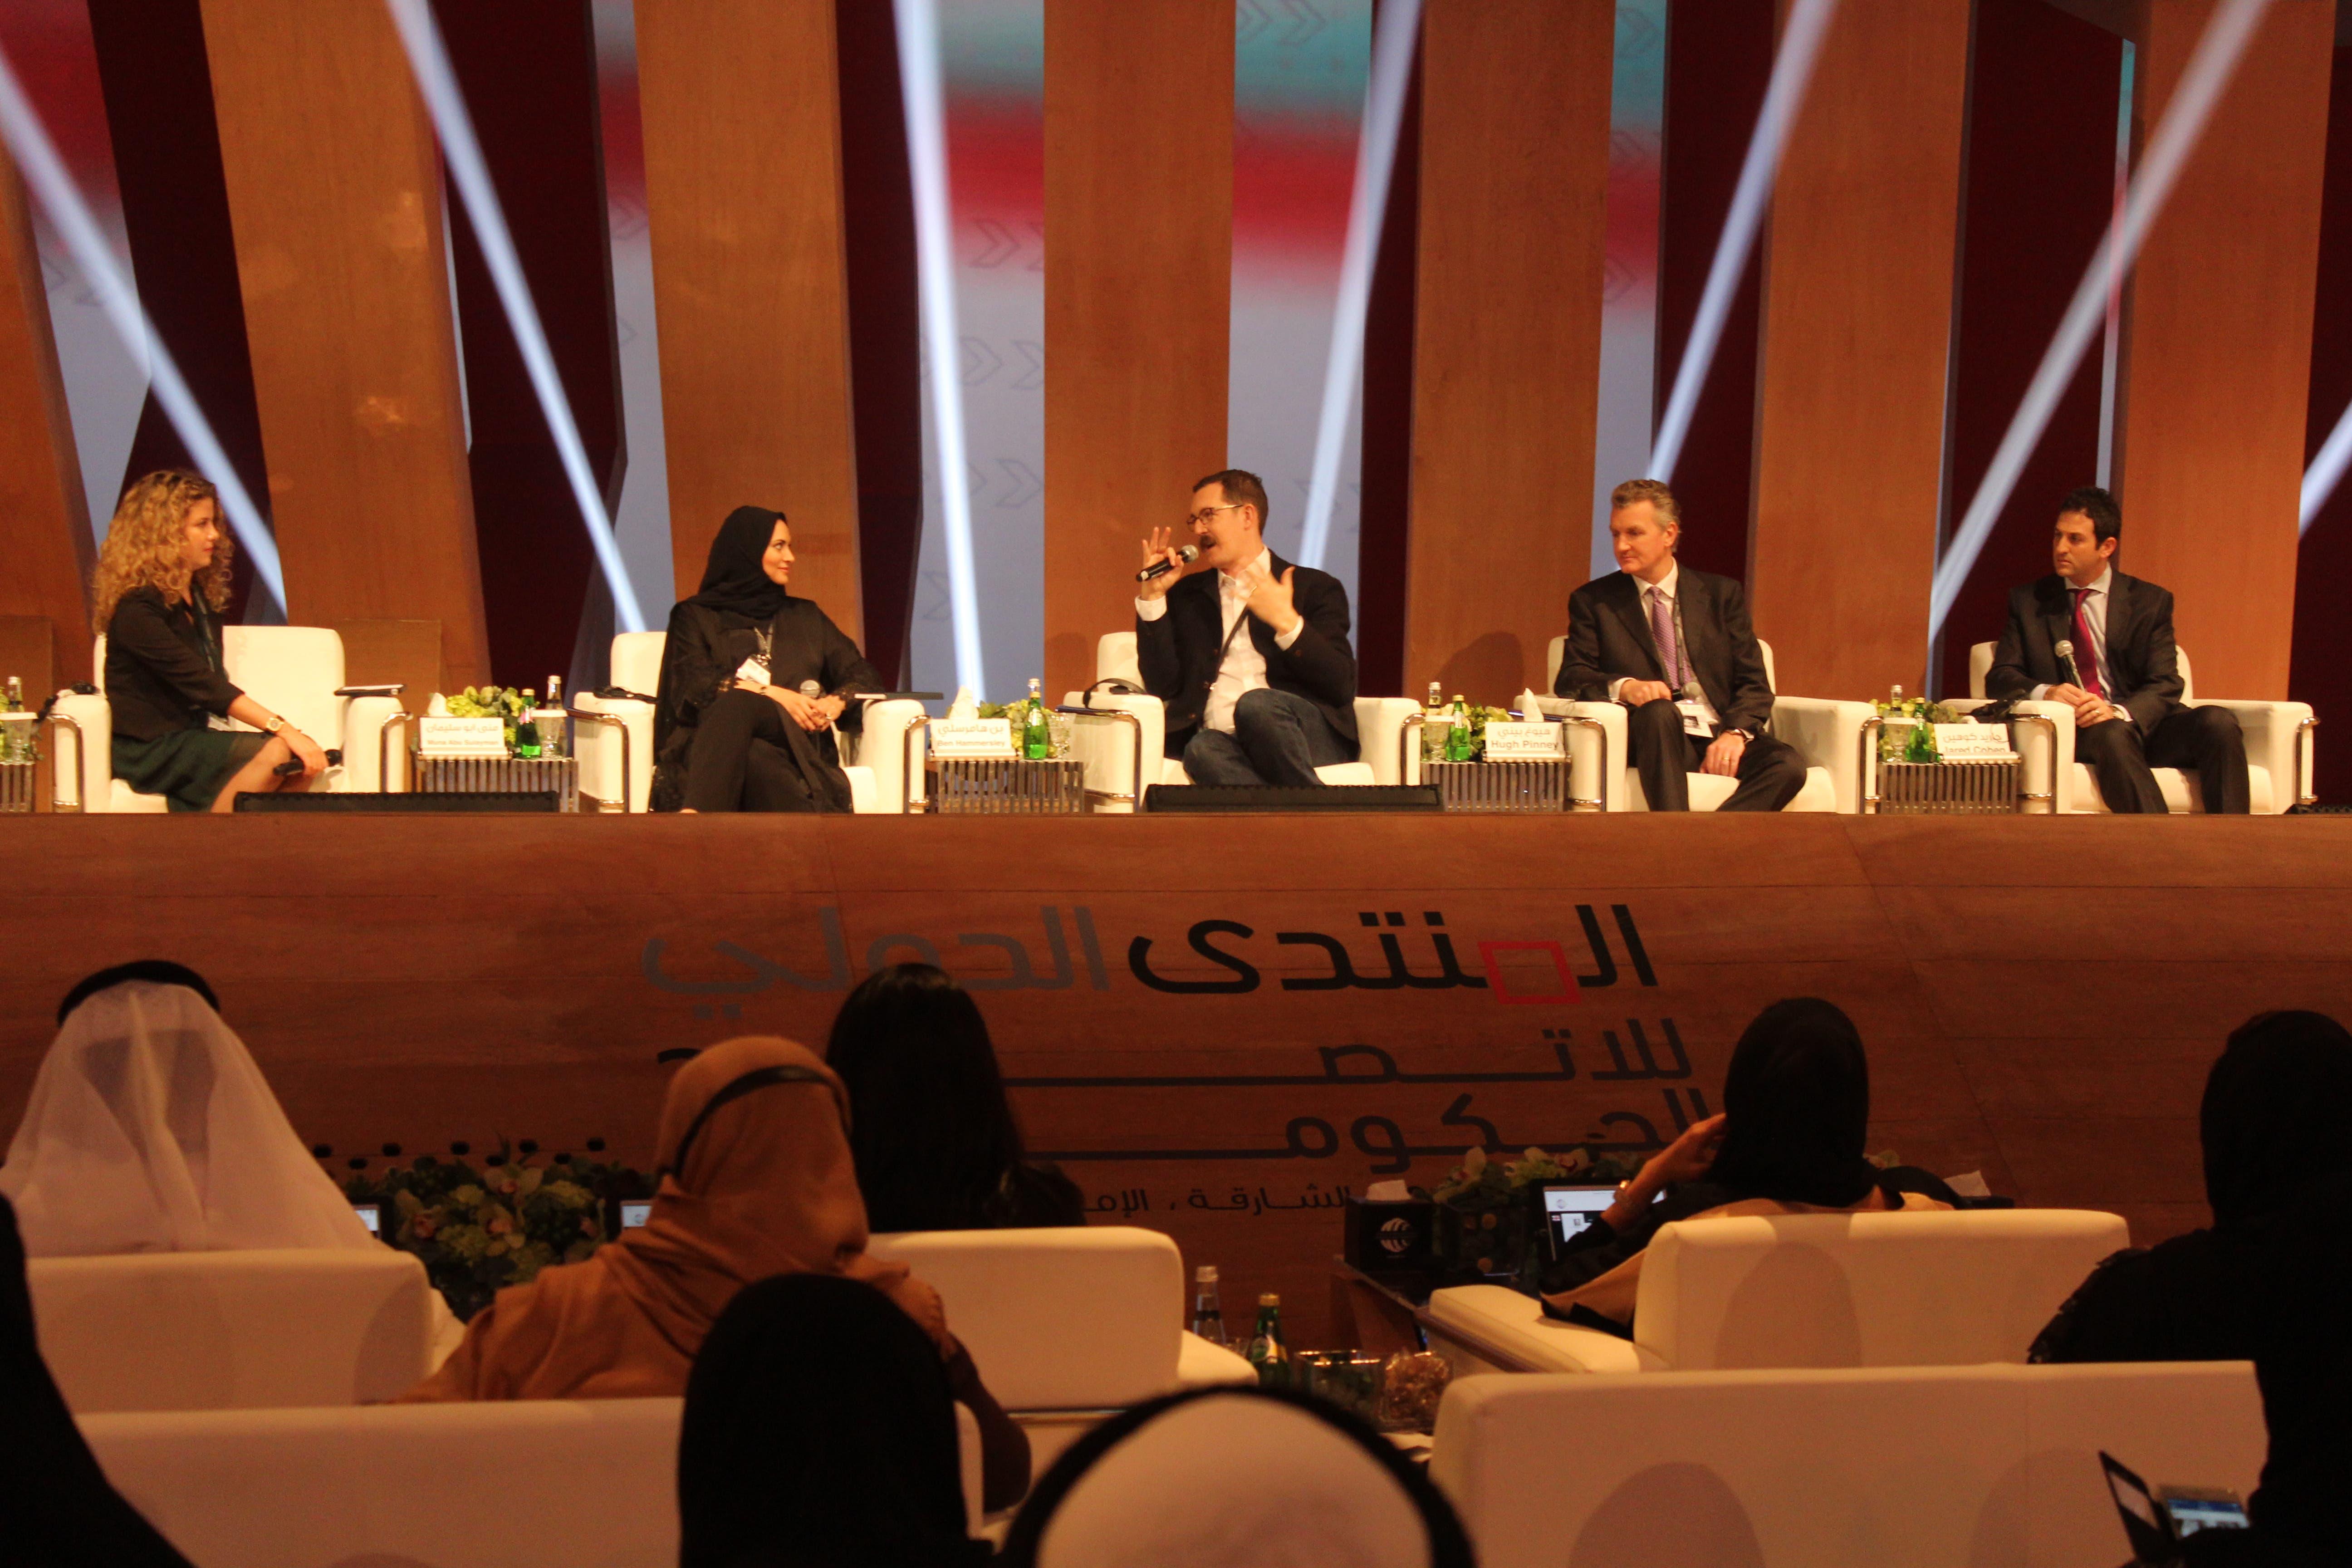 Al Arabiya News Anchor Rima Maktabi (L-R), MBC presenter Muna Abu Sulayman, Journalist Ben Hammersley, Hugh Pinny from EMEA and Jared Cohen, founder of Google Ideas, participate in a panel at IGCF Sharjah. (Shounaz Meky/ Al Arabiya News)